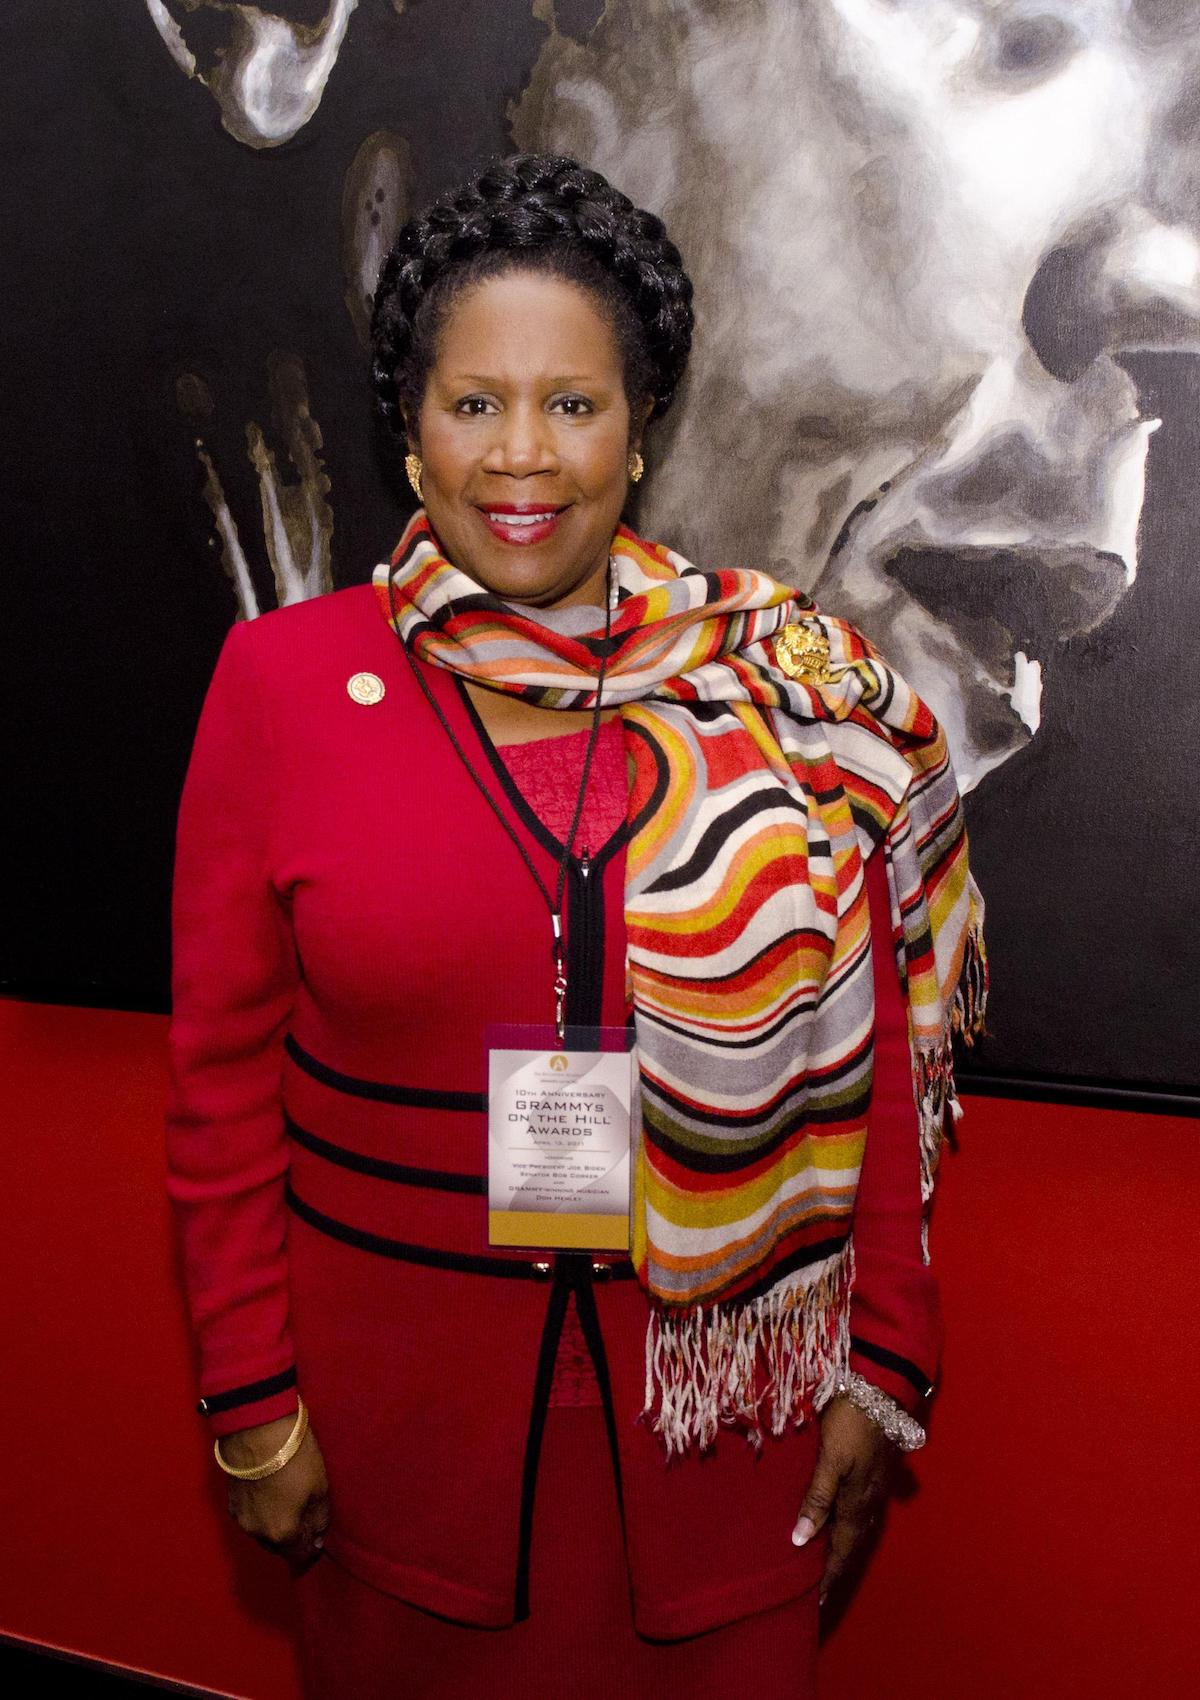 Shelia Jackson Lee, Willoughby Avenue, The Five Fifths, KOLUMN Magazine, KOLUMN, African American Politics, Blacks in Politics, Black Vote, Vote Black